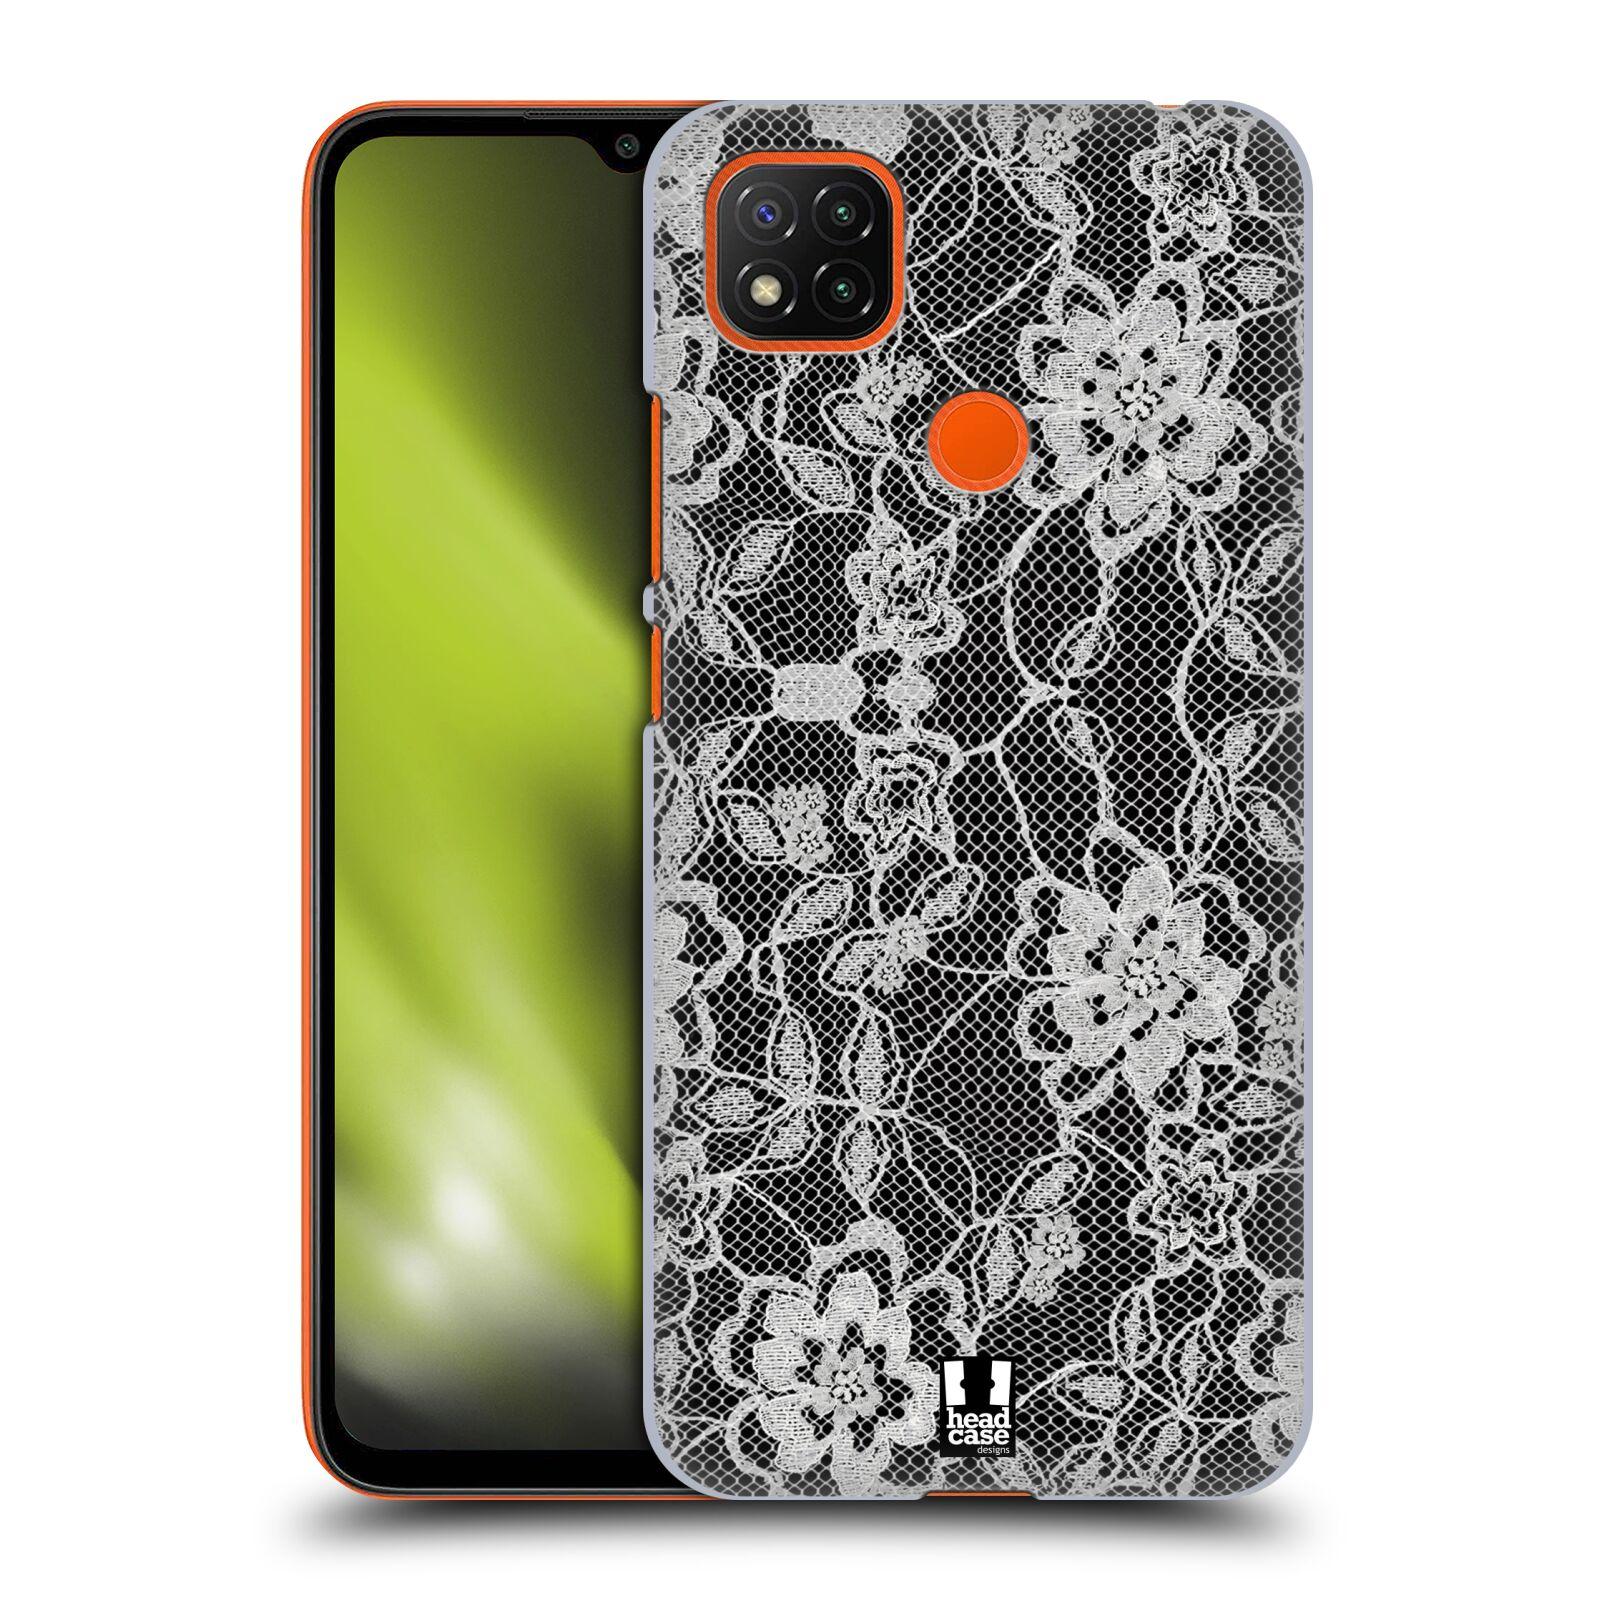 Plastové pouzdro na mobil Xiaomi Redmi 9C - Head Case - FLOWERY KRAJKA